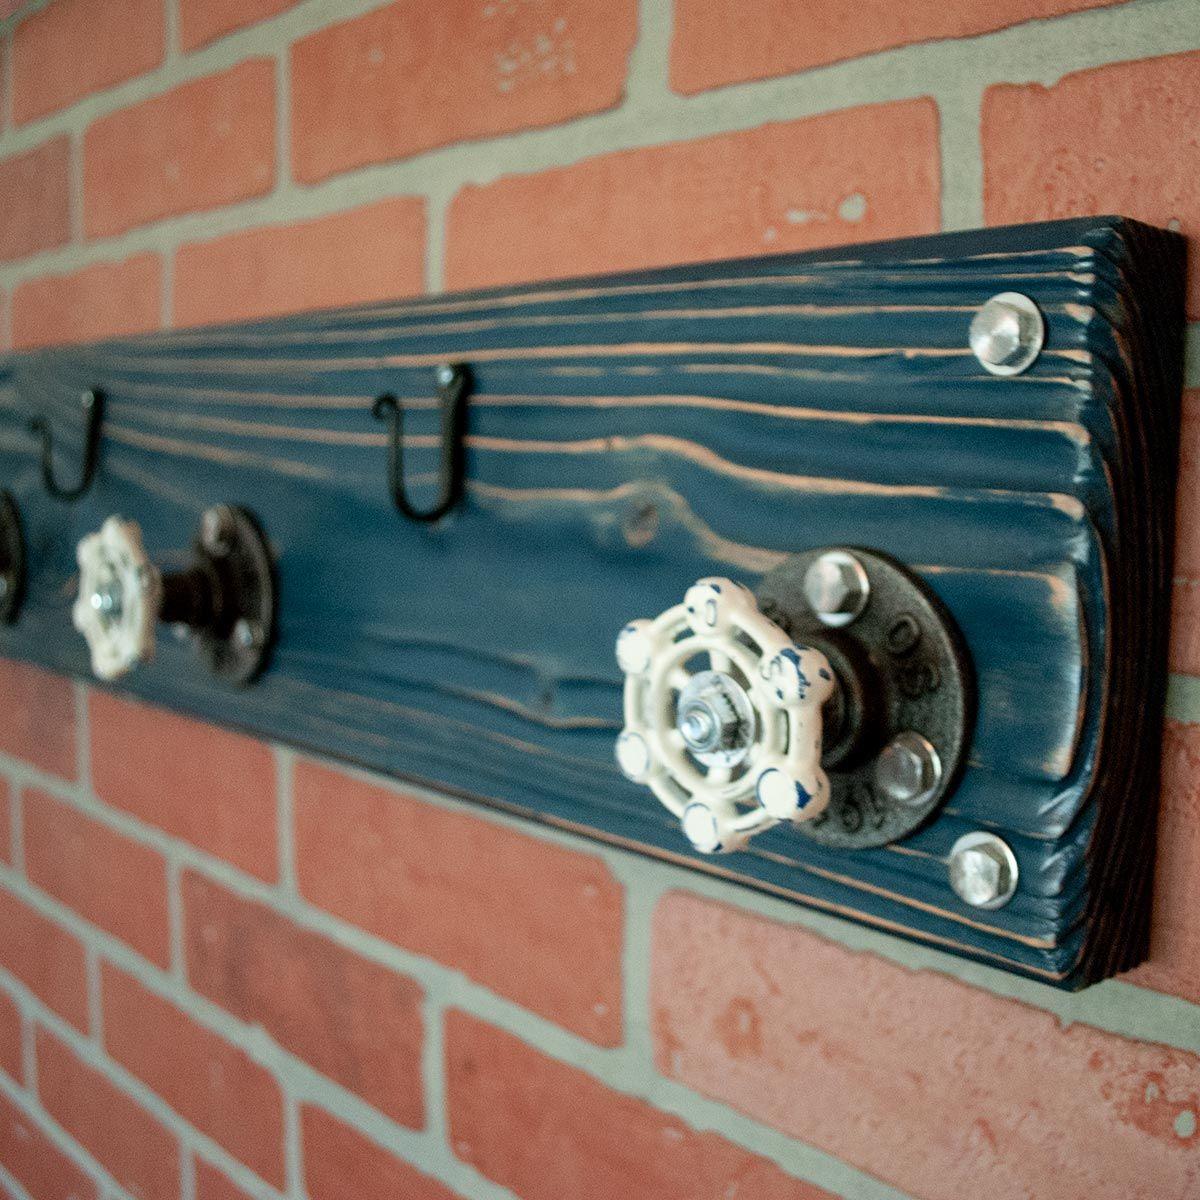 Aged wood modern farmhouse coat hanger with iron key